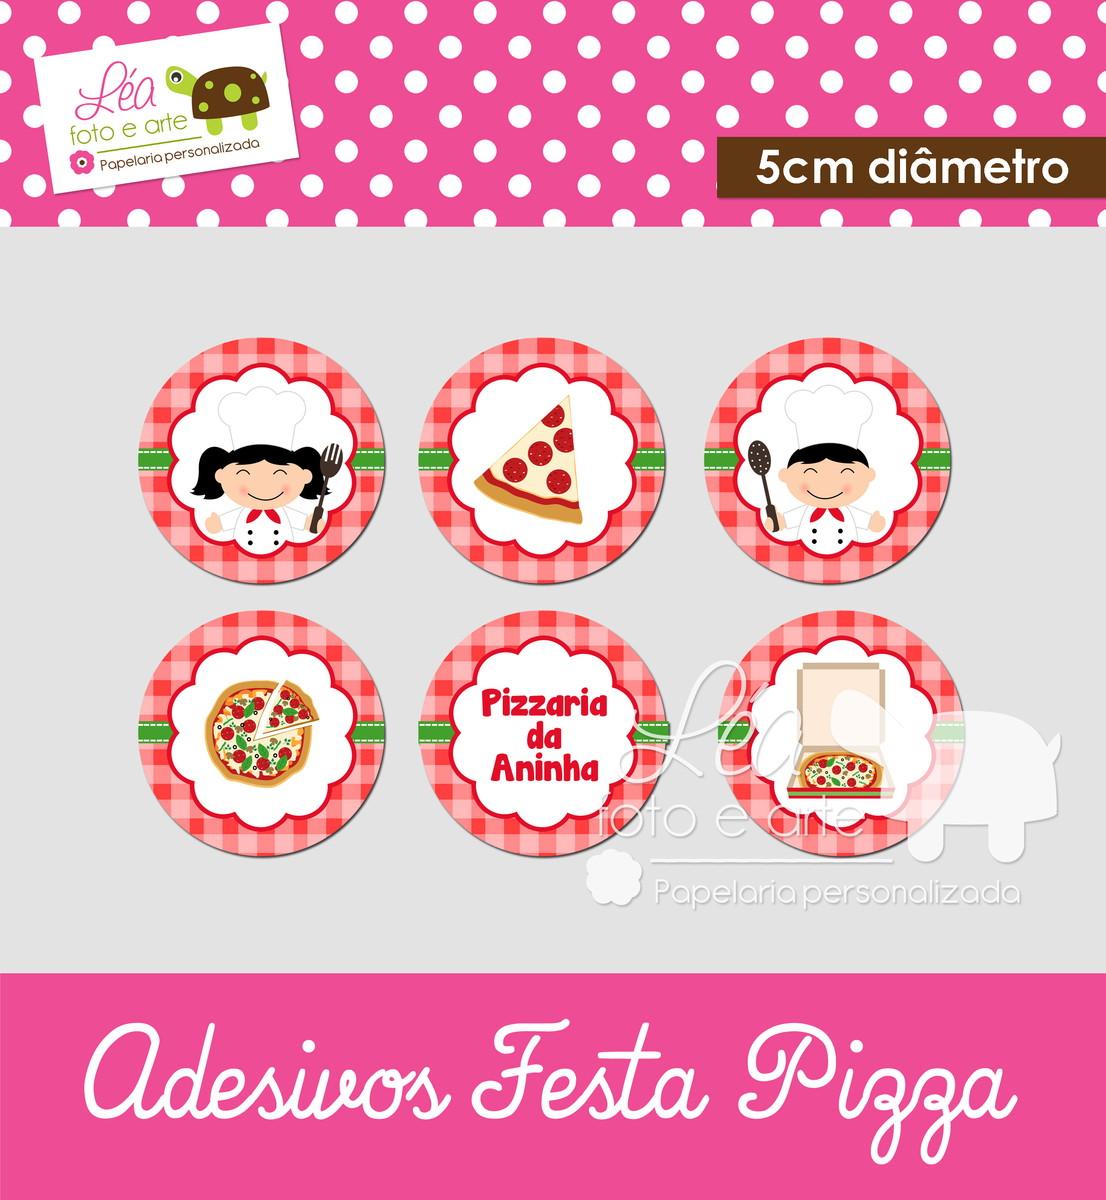 Artesanato Ideias De Natal ~ Tags Ou Adesivos Redondos Festa Pizza Léa foto e arte